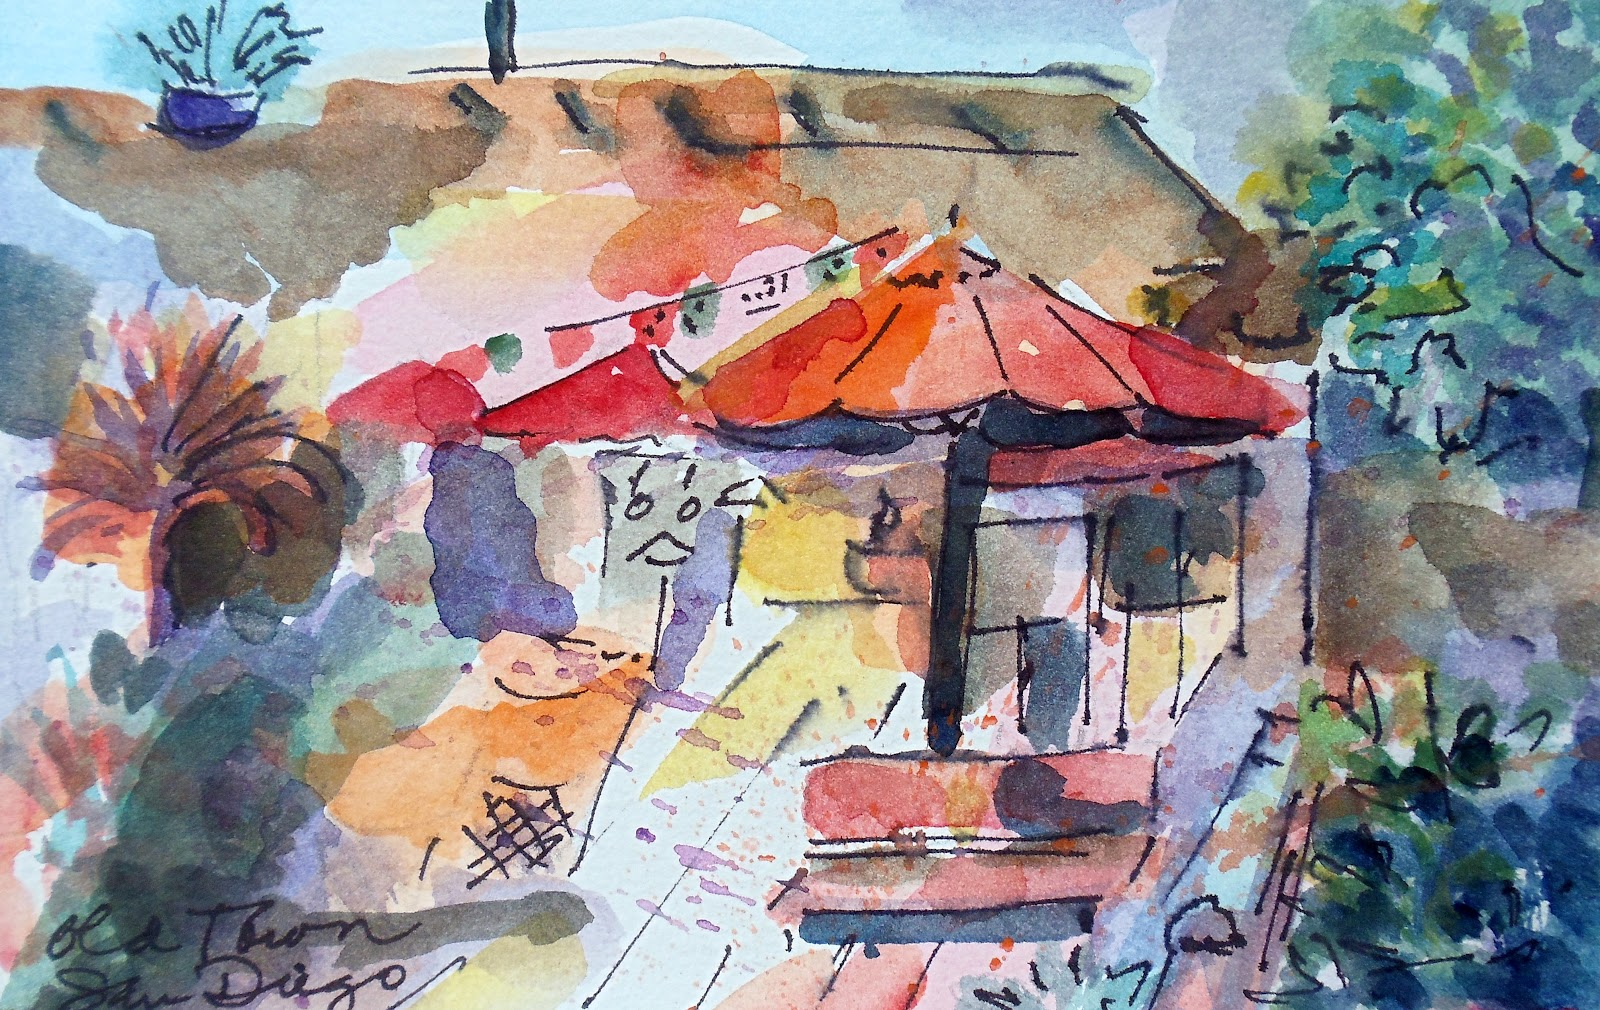 1600x1010 Minnie Valero Balboa Park Iii, San Diego, Watercolor